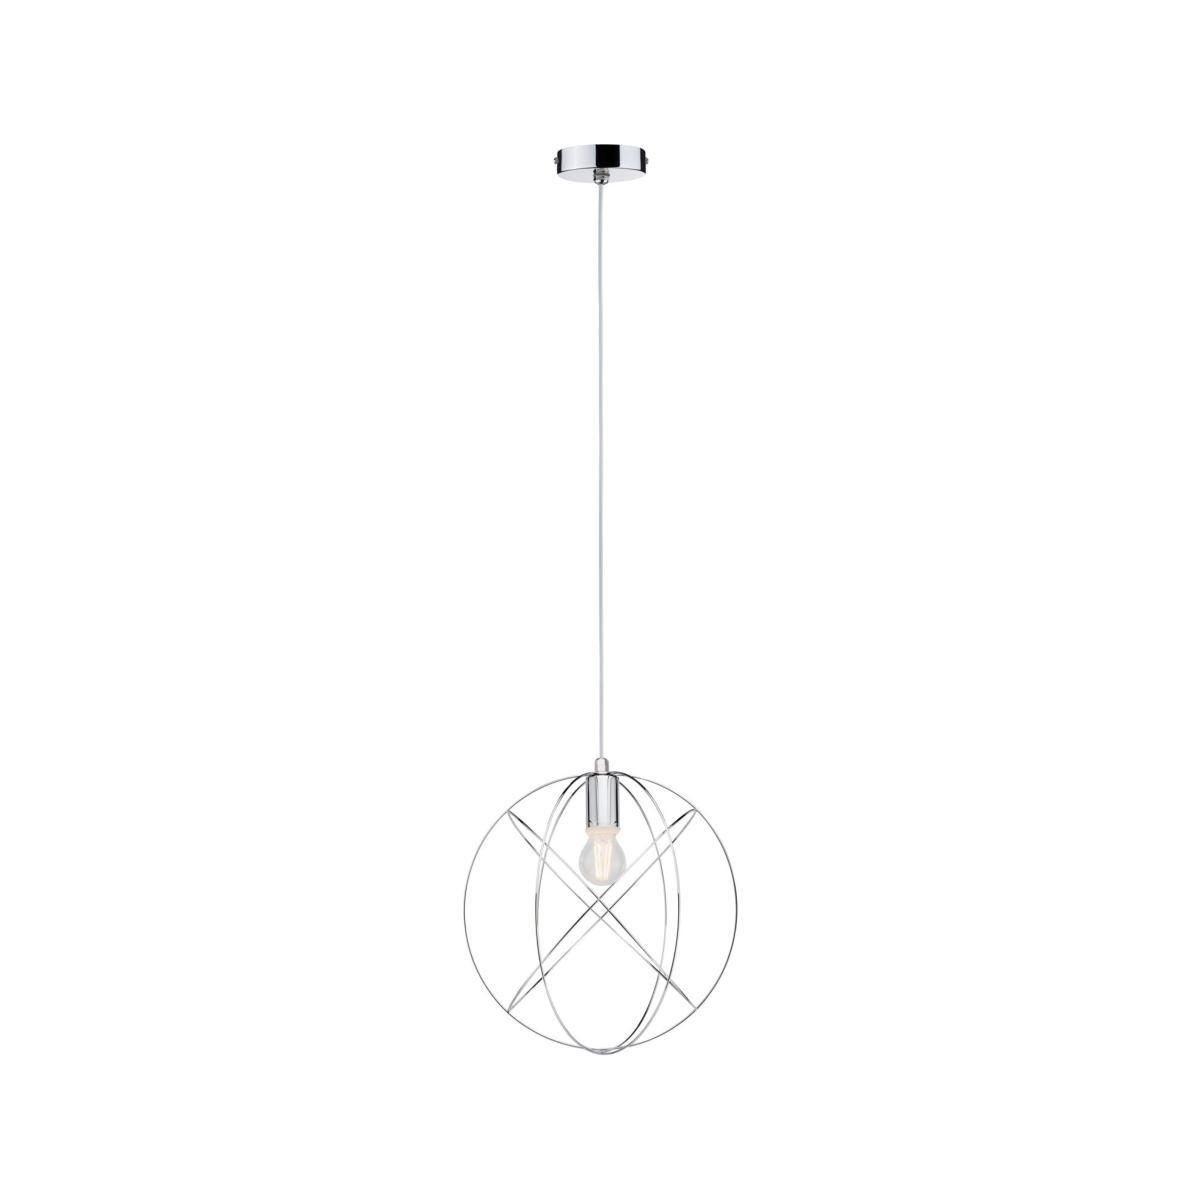 suspension ip44 ip modern pir sensor stainless steel outdoor garden wall light lantern lights. Black Bedroom Furniture Sets. Home Design Ideas